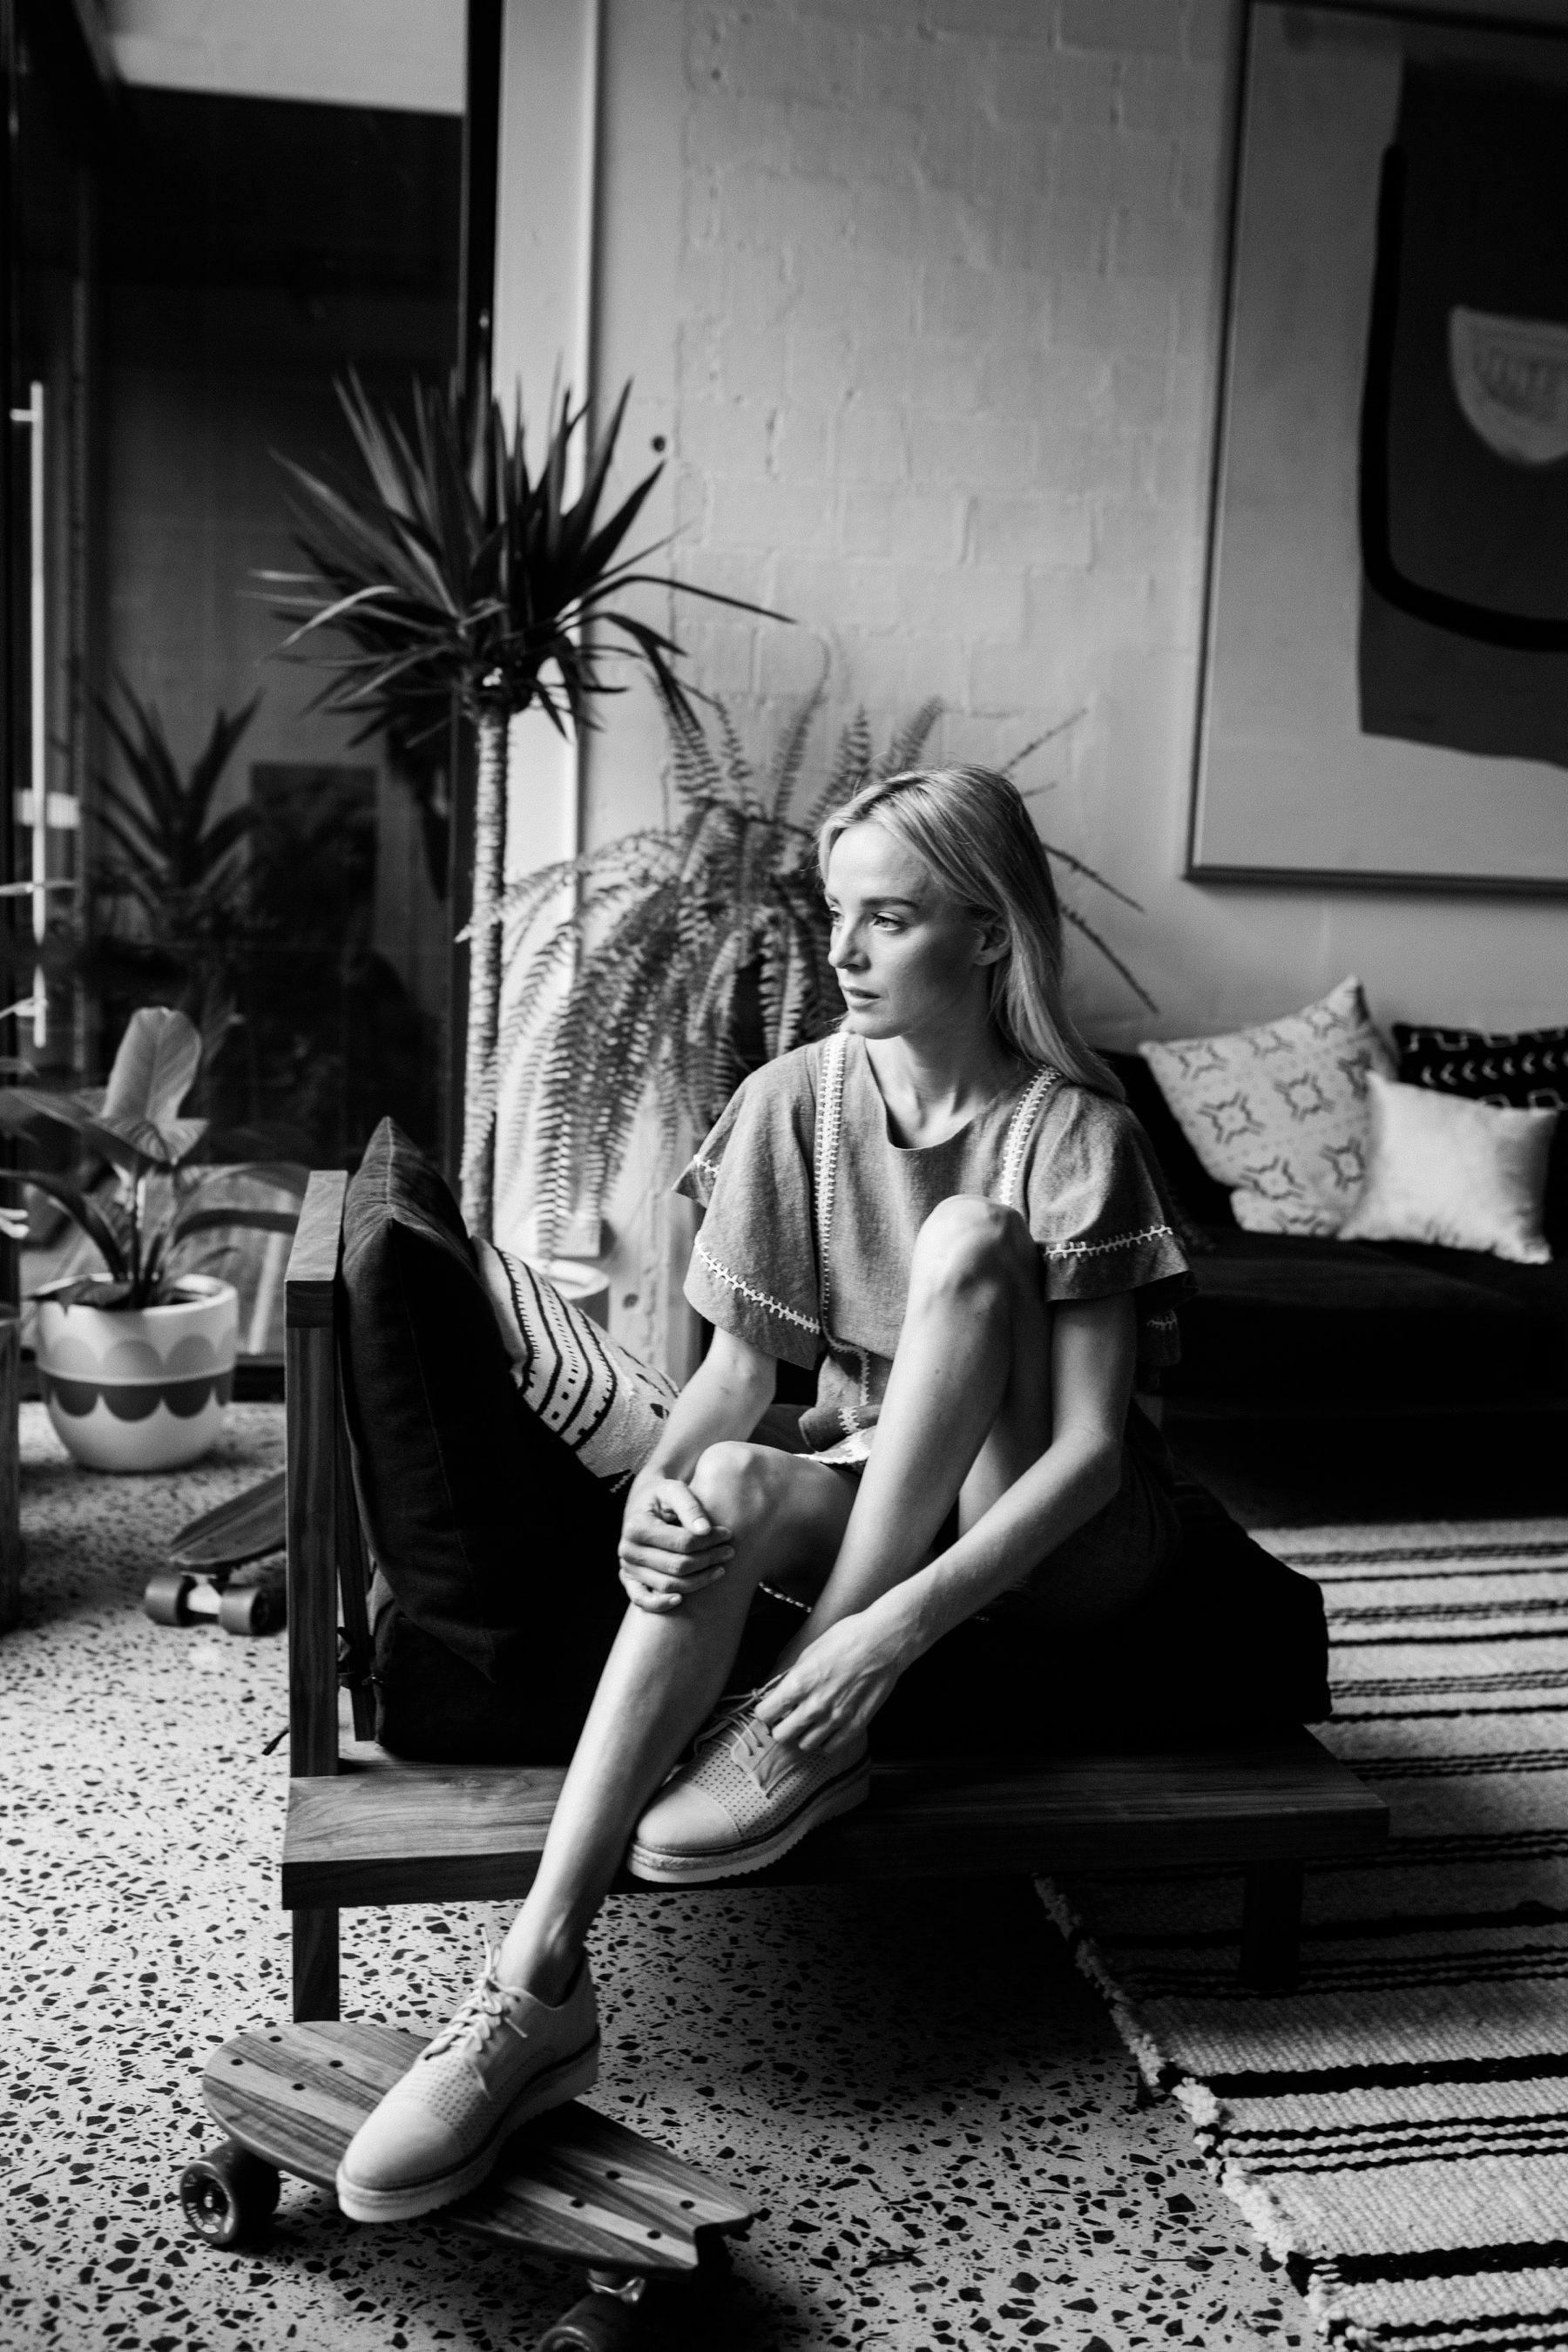 Photograph: Alice Mahran || All Garments And Kicks Via Seed Heritage. Model: